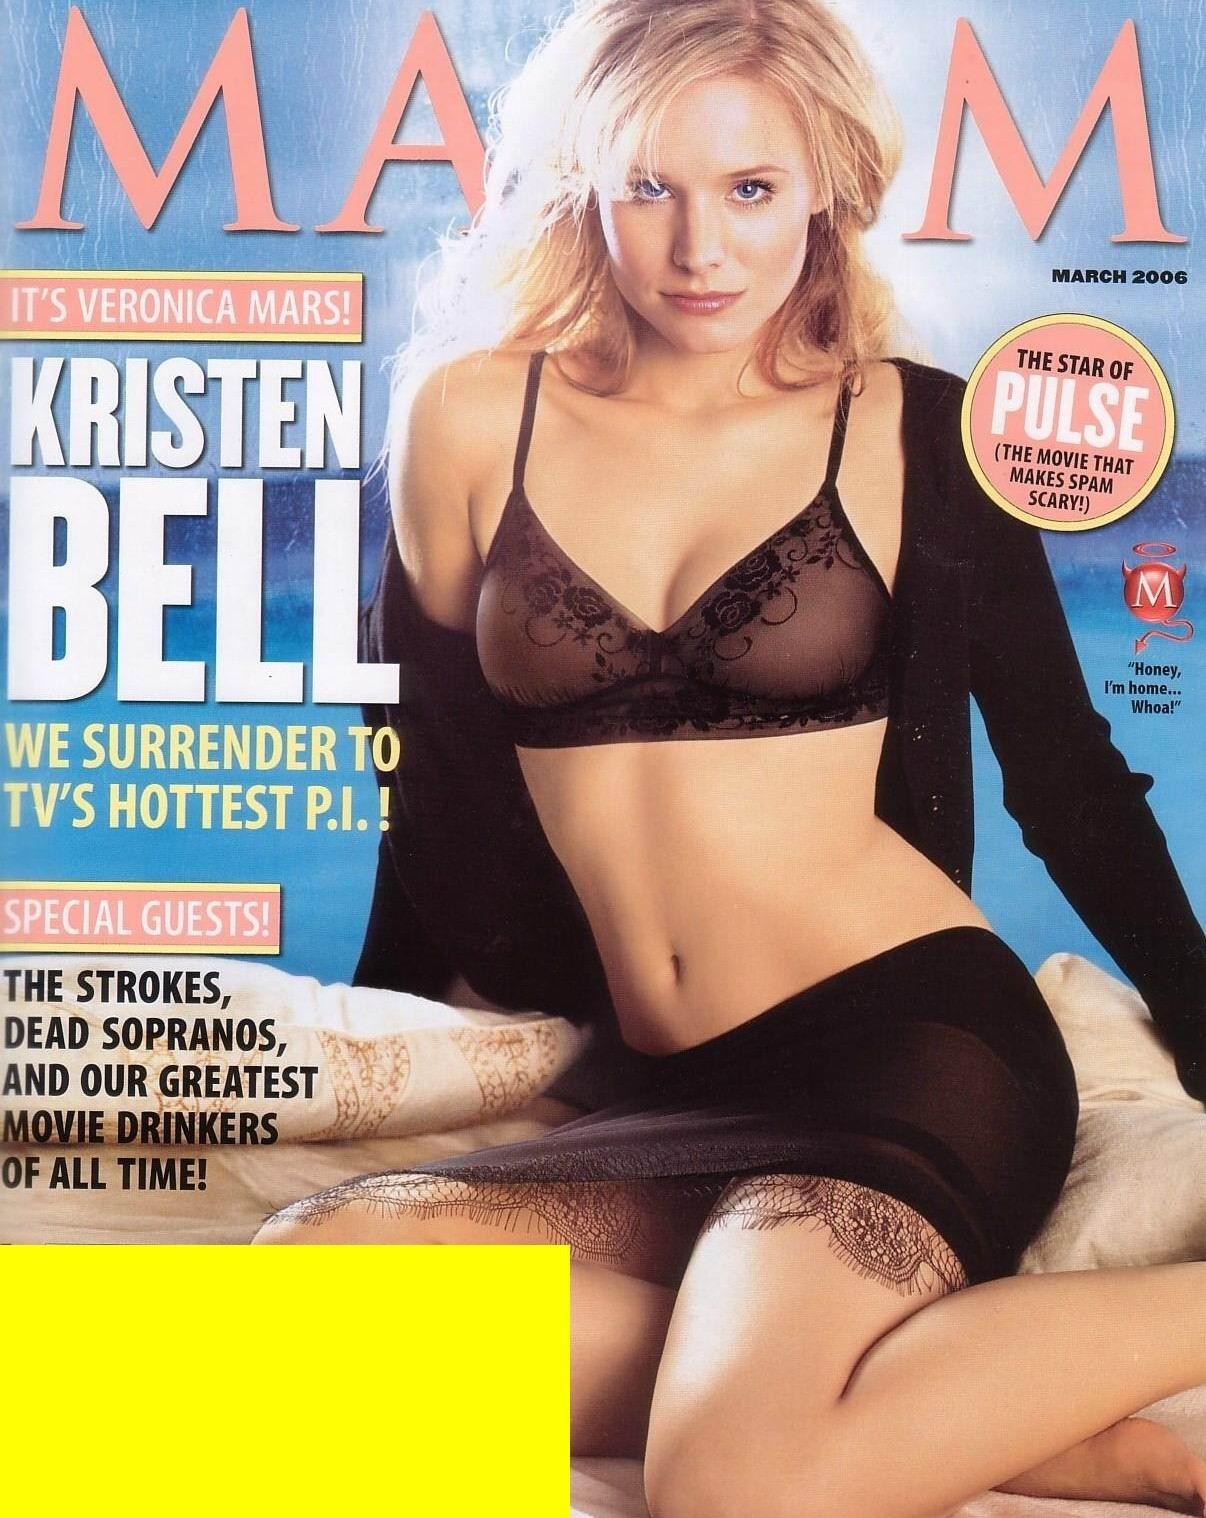 Kristen Bell dedos